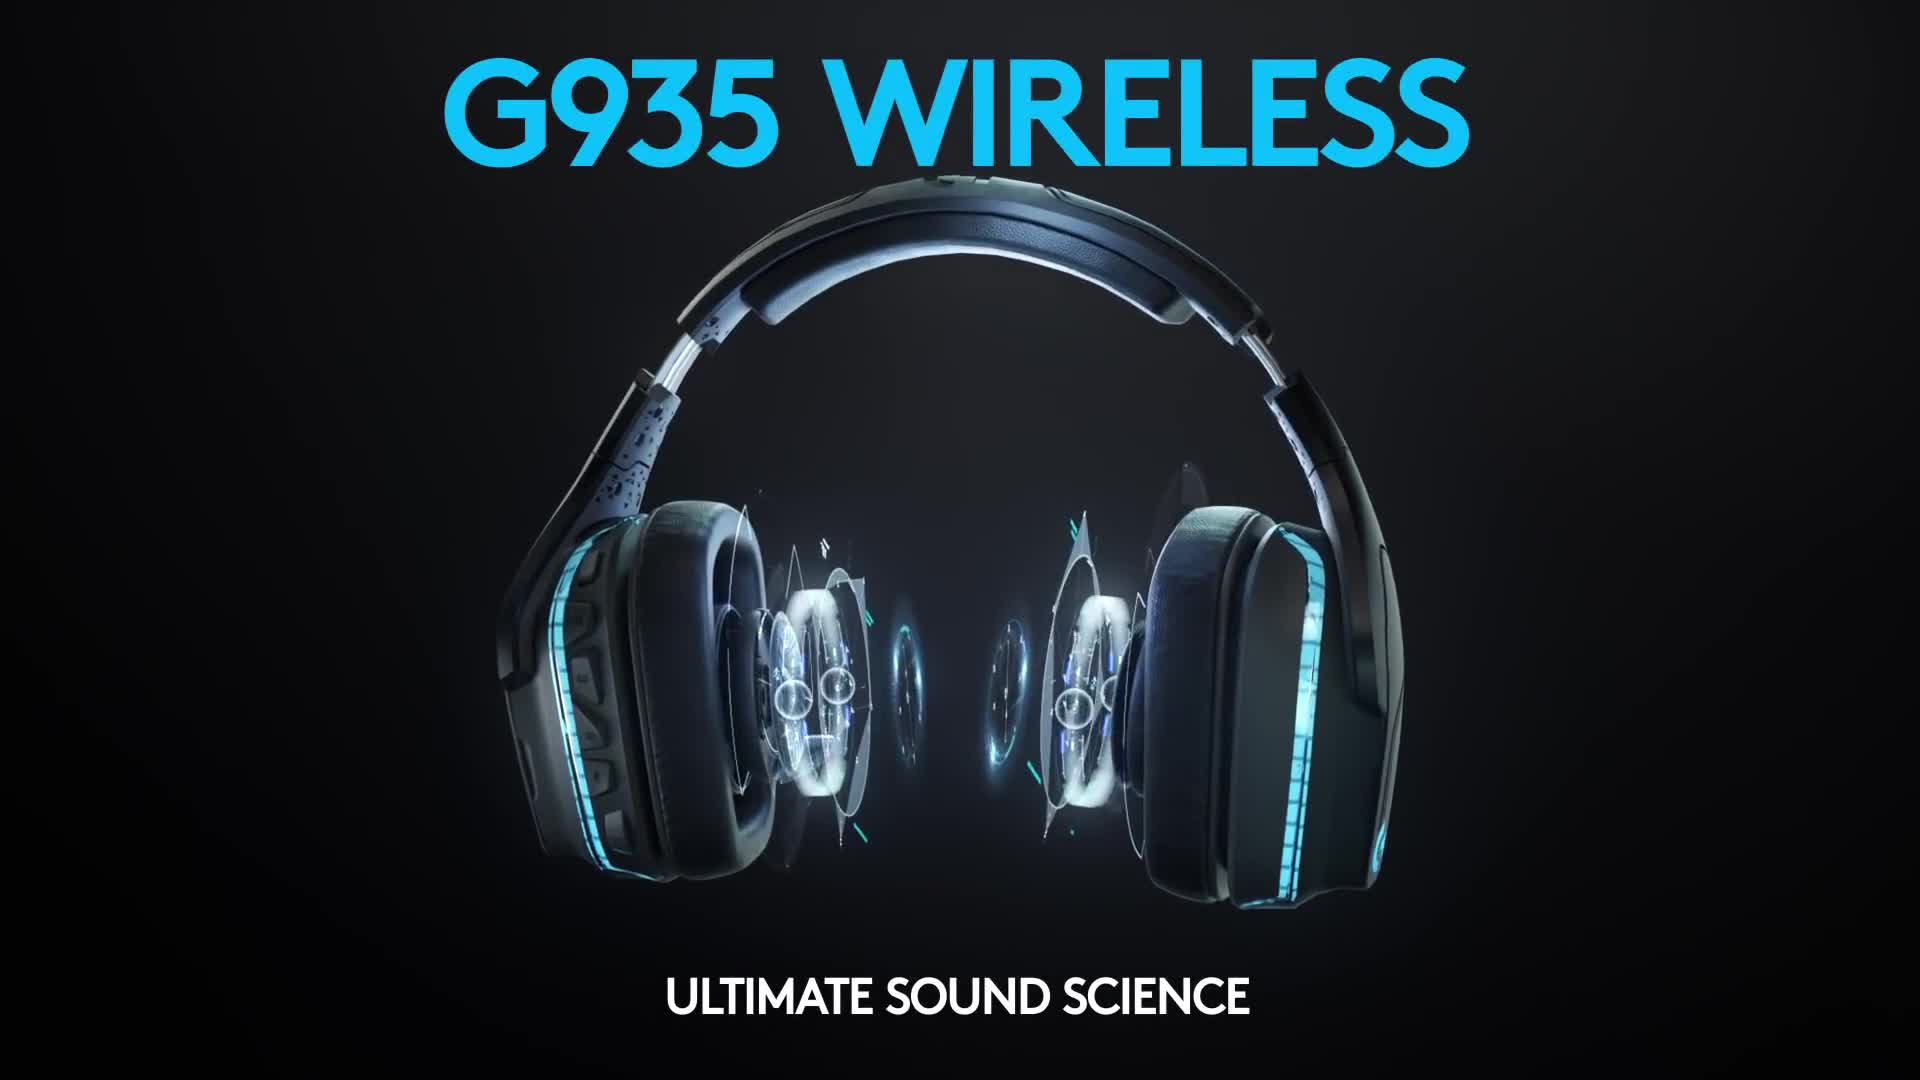 Headset, Wireless, Logitech, Wireless Headset, Logitech G935, G935